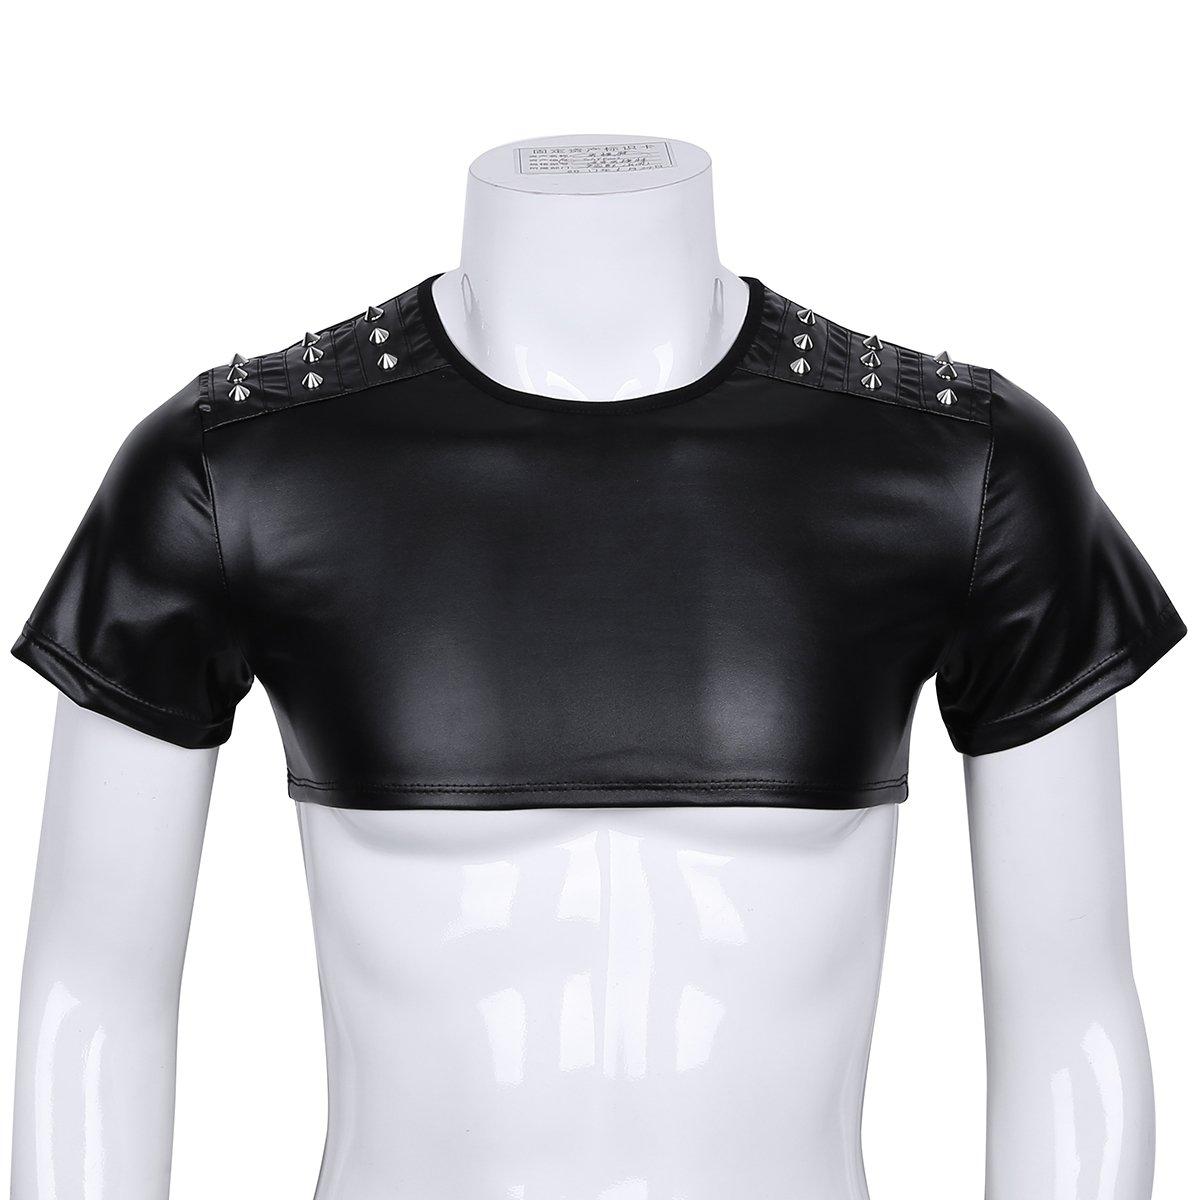 99ddee43770b iiniim Herren Shirt Wetlook Tank Top Kurze Shirt Weste Unterhemd Muskelshirt  Party Clubwear Schwarz M-XXL  Amazon.de  Bekleidung